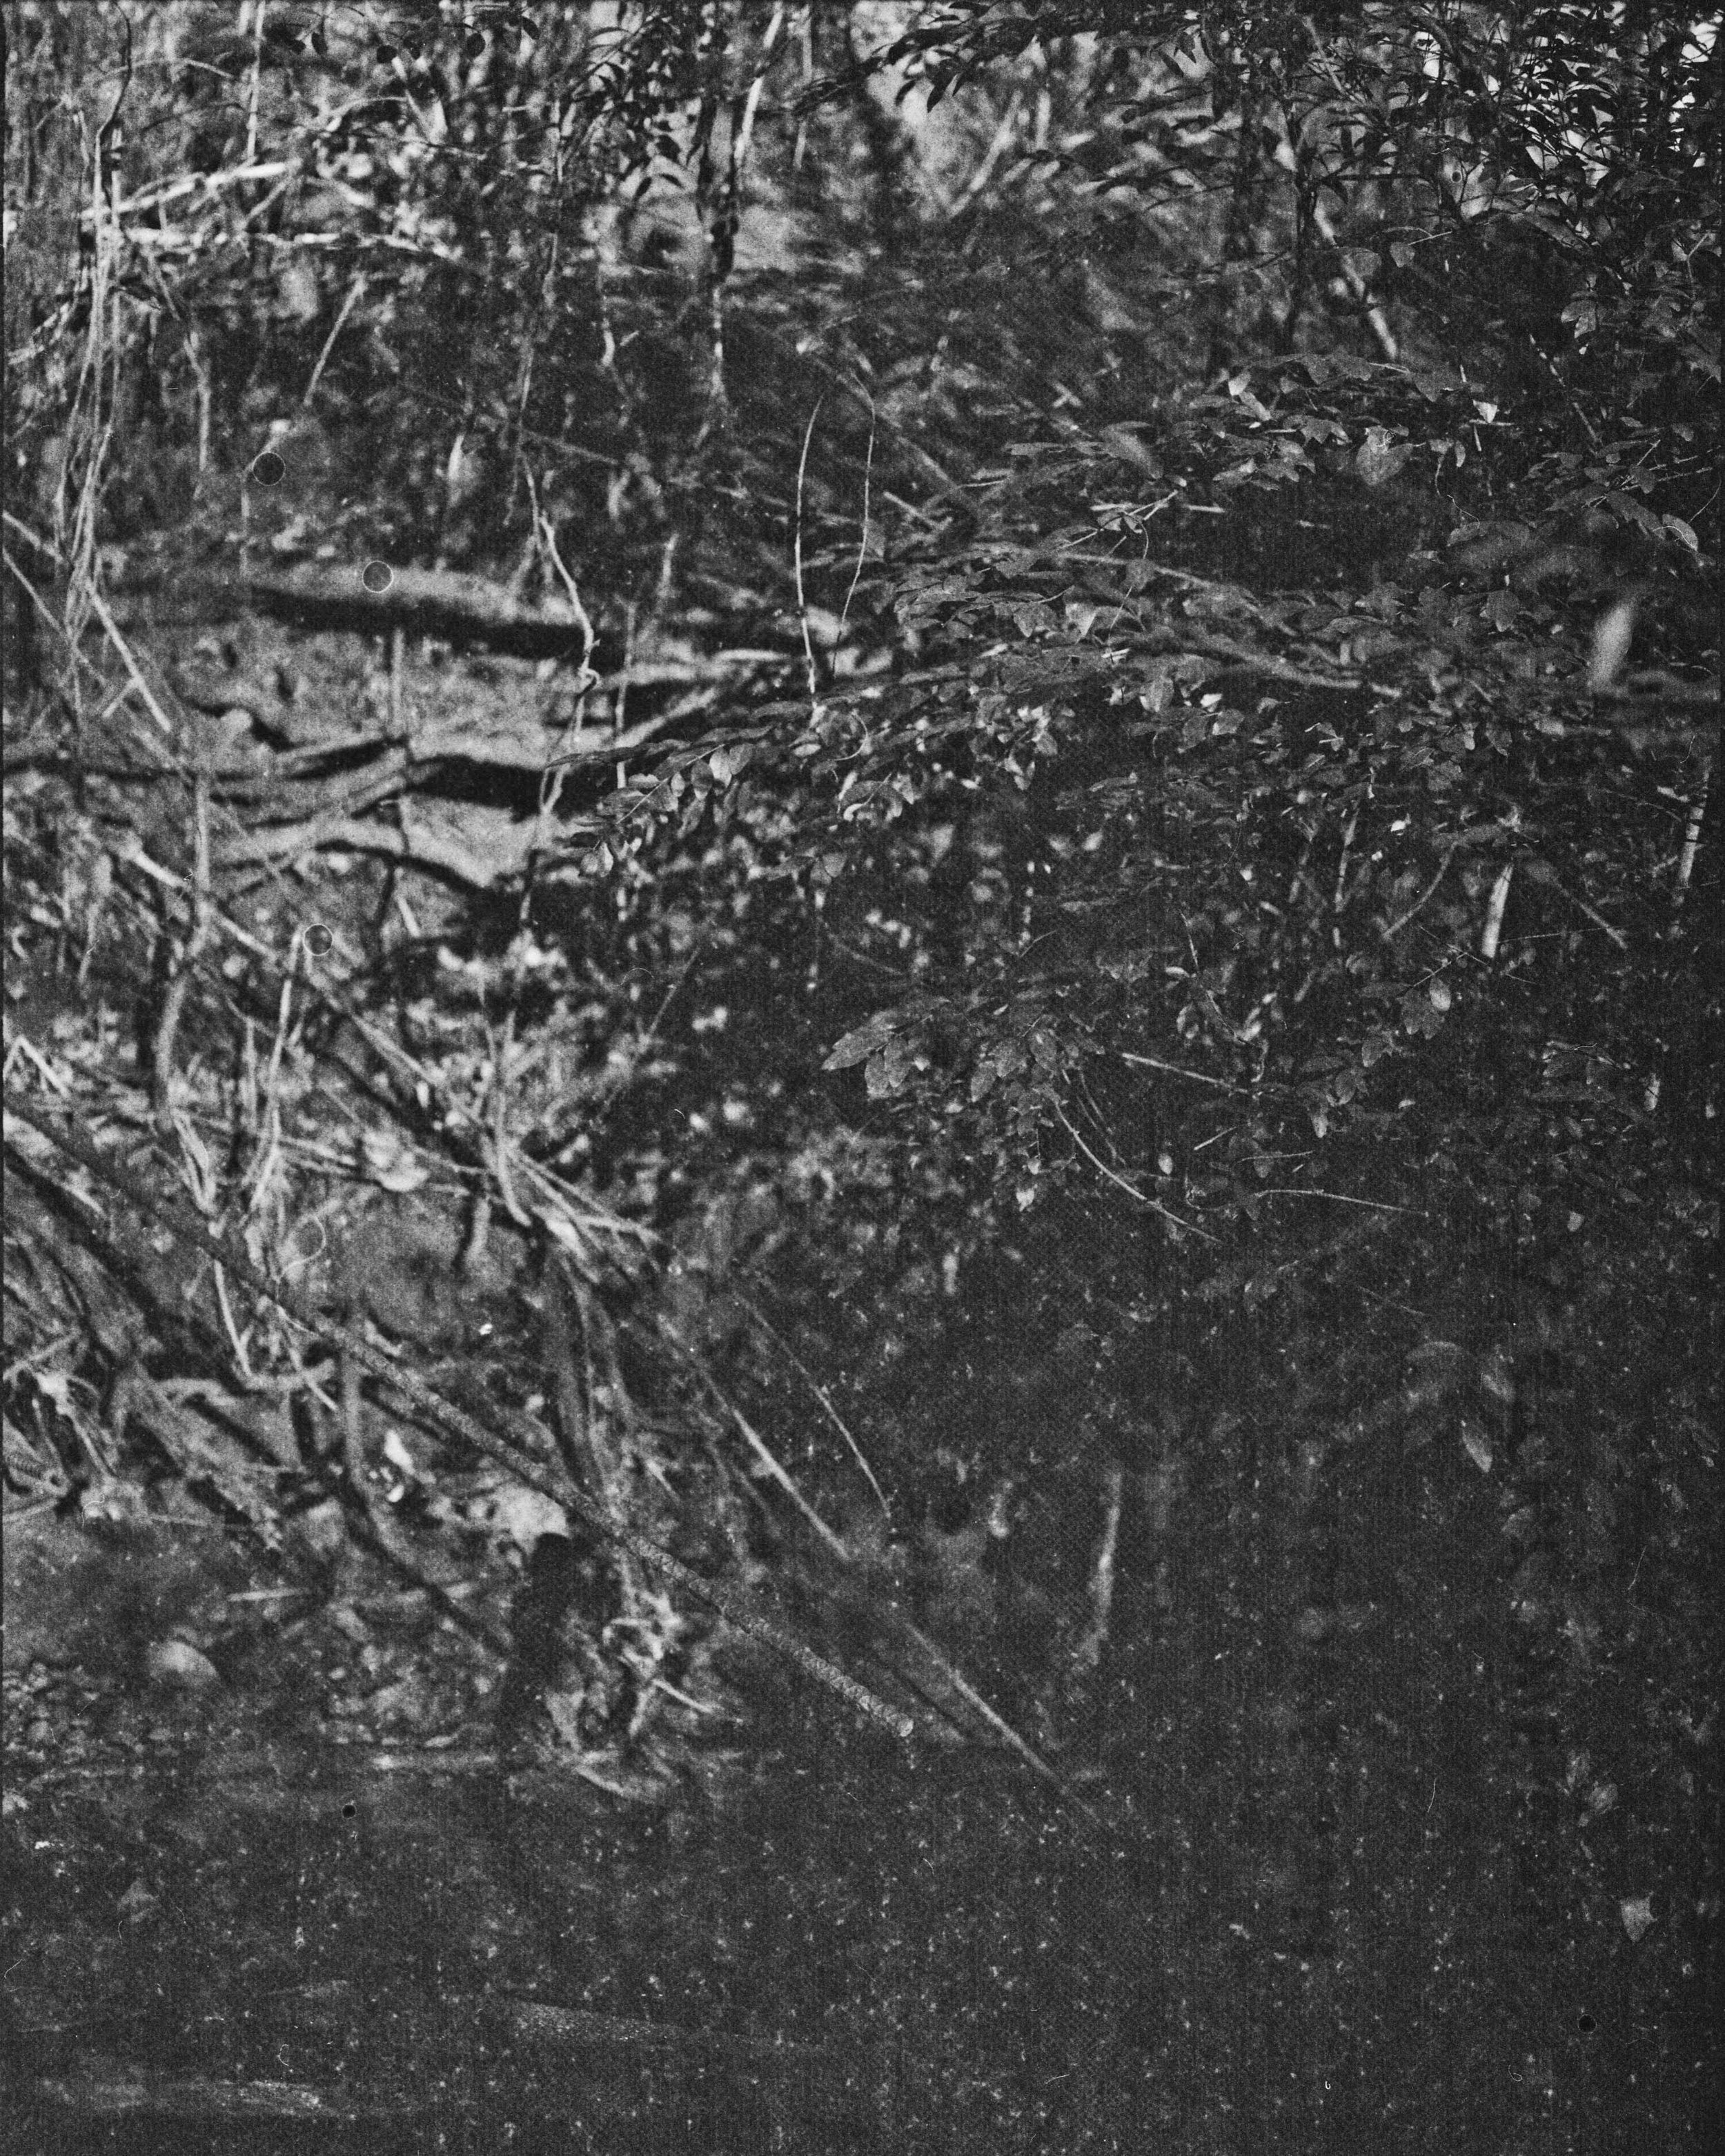 lydiasee-creekoffspringdale2014-color120mm-batch138.JPG